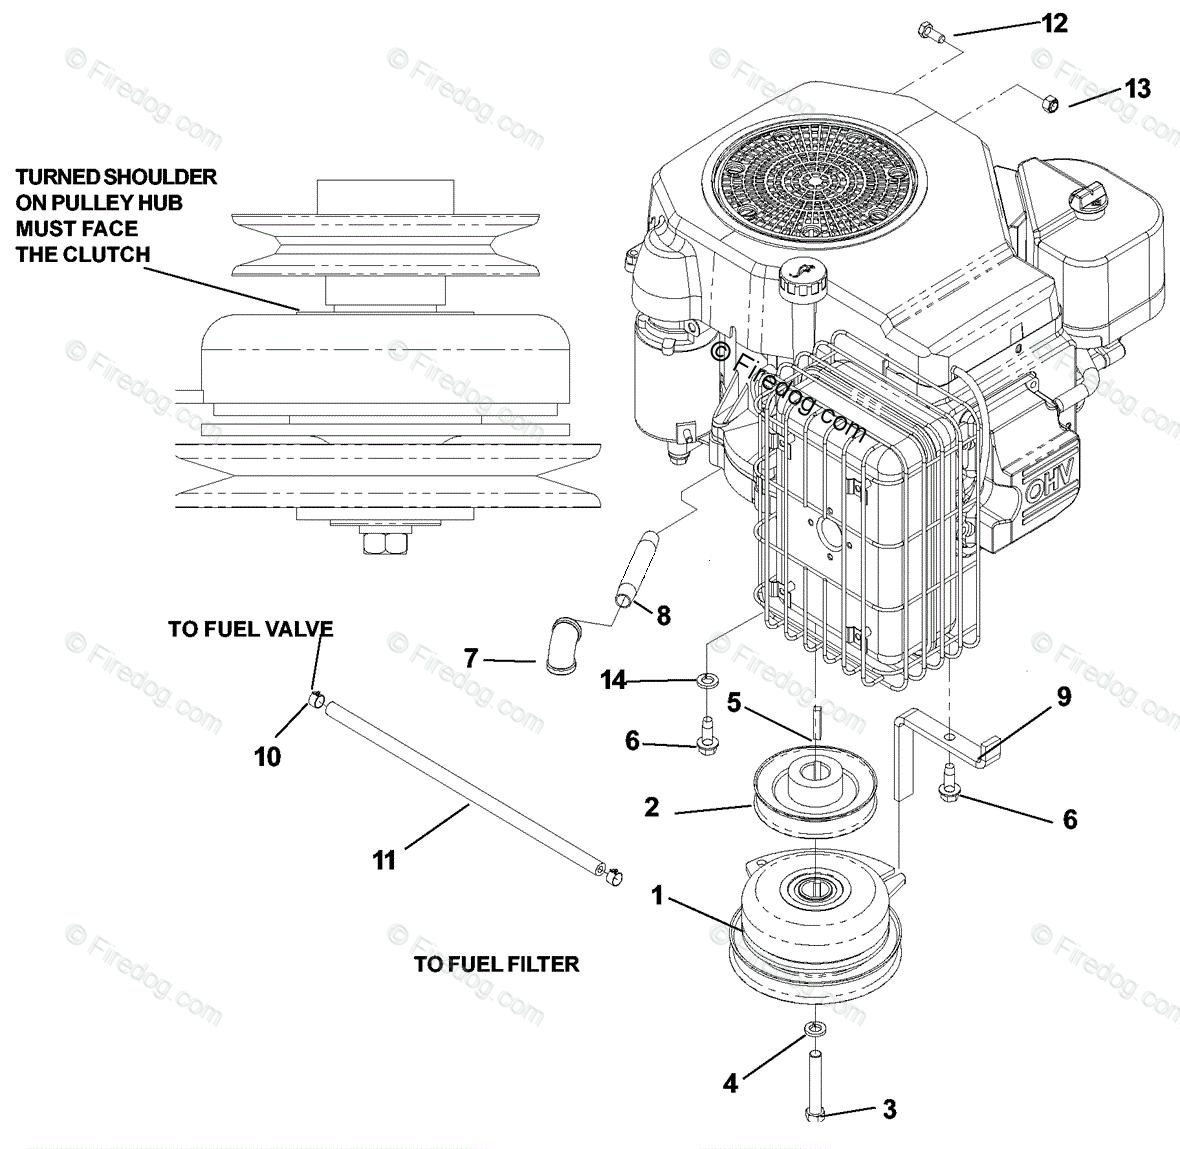 Husqvarna Ride Mower Turf Care Cz 4817 Koa 968999220 2002 11 Kohler Engine Parts Diagram Oem For Assembly